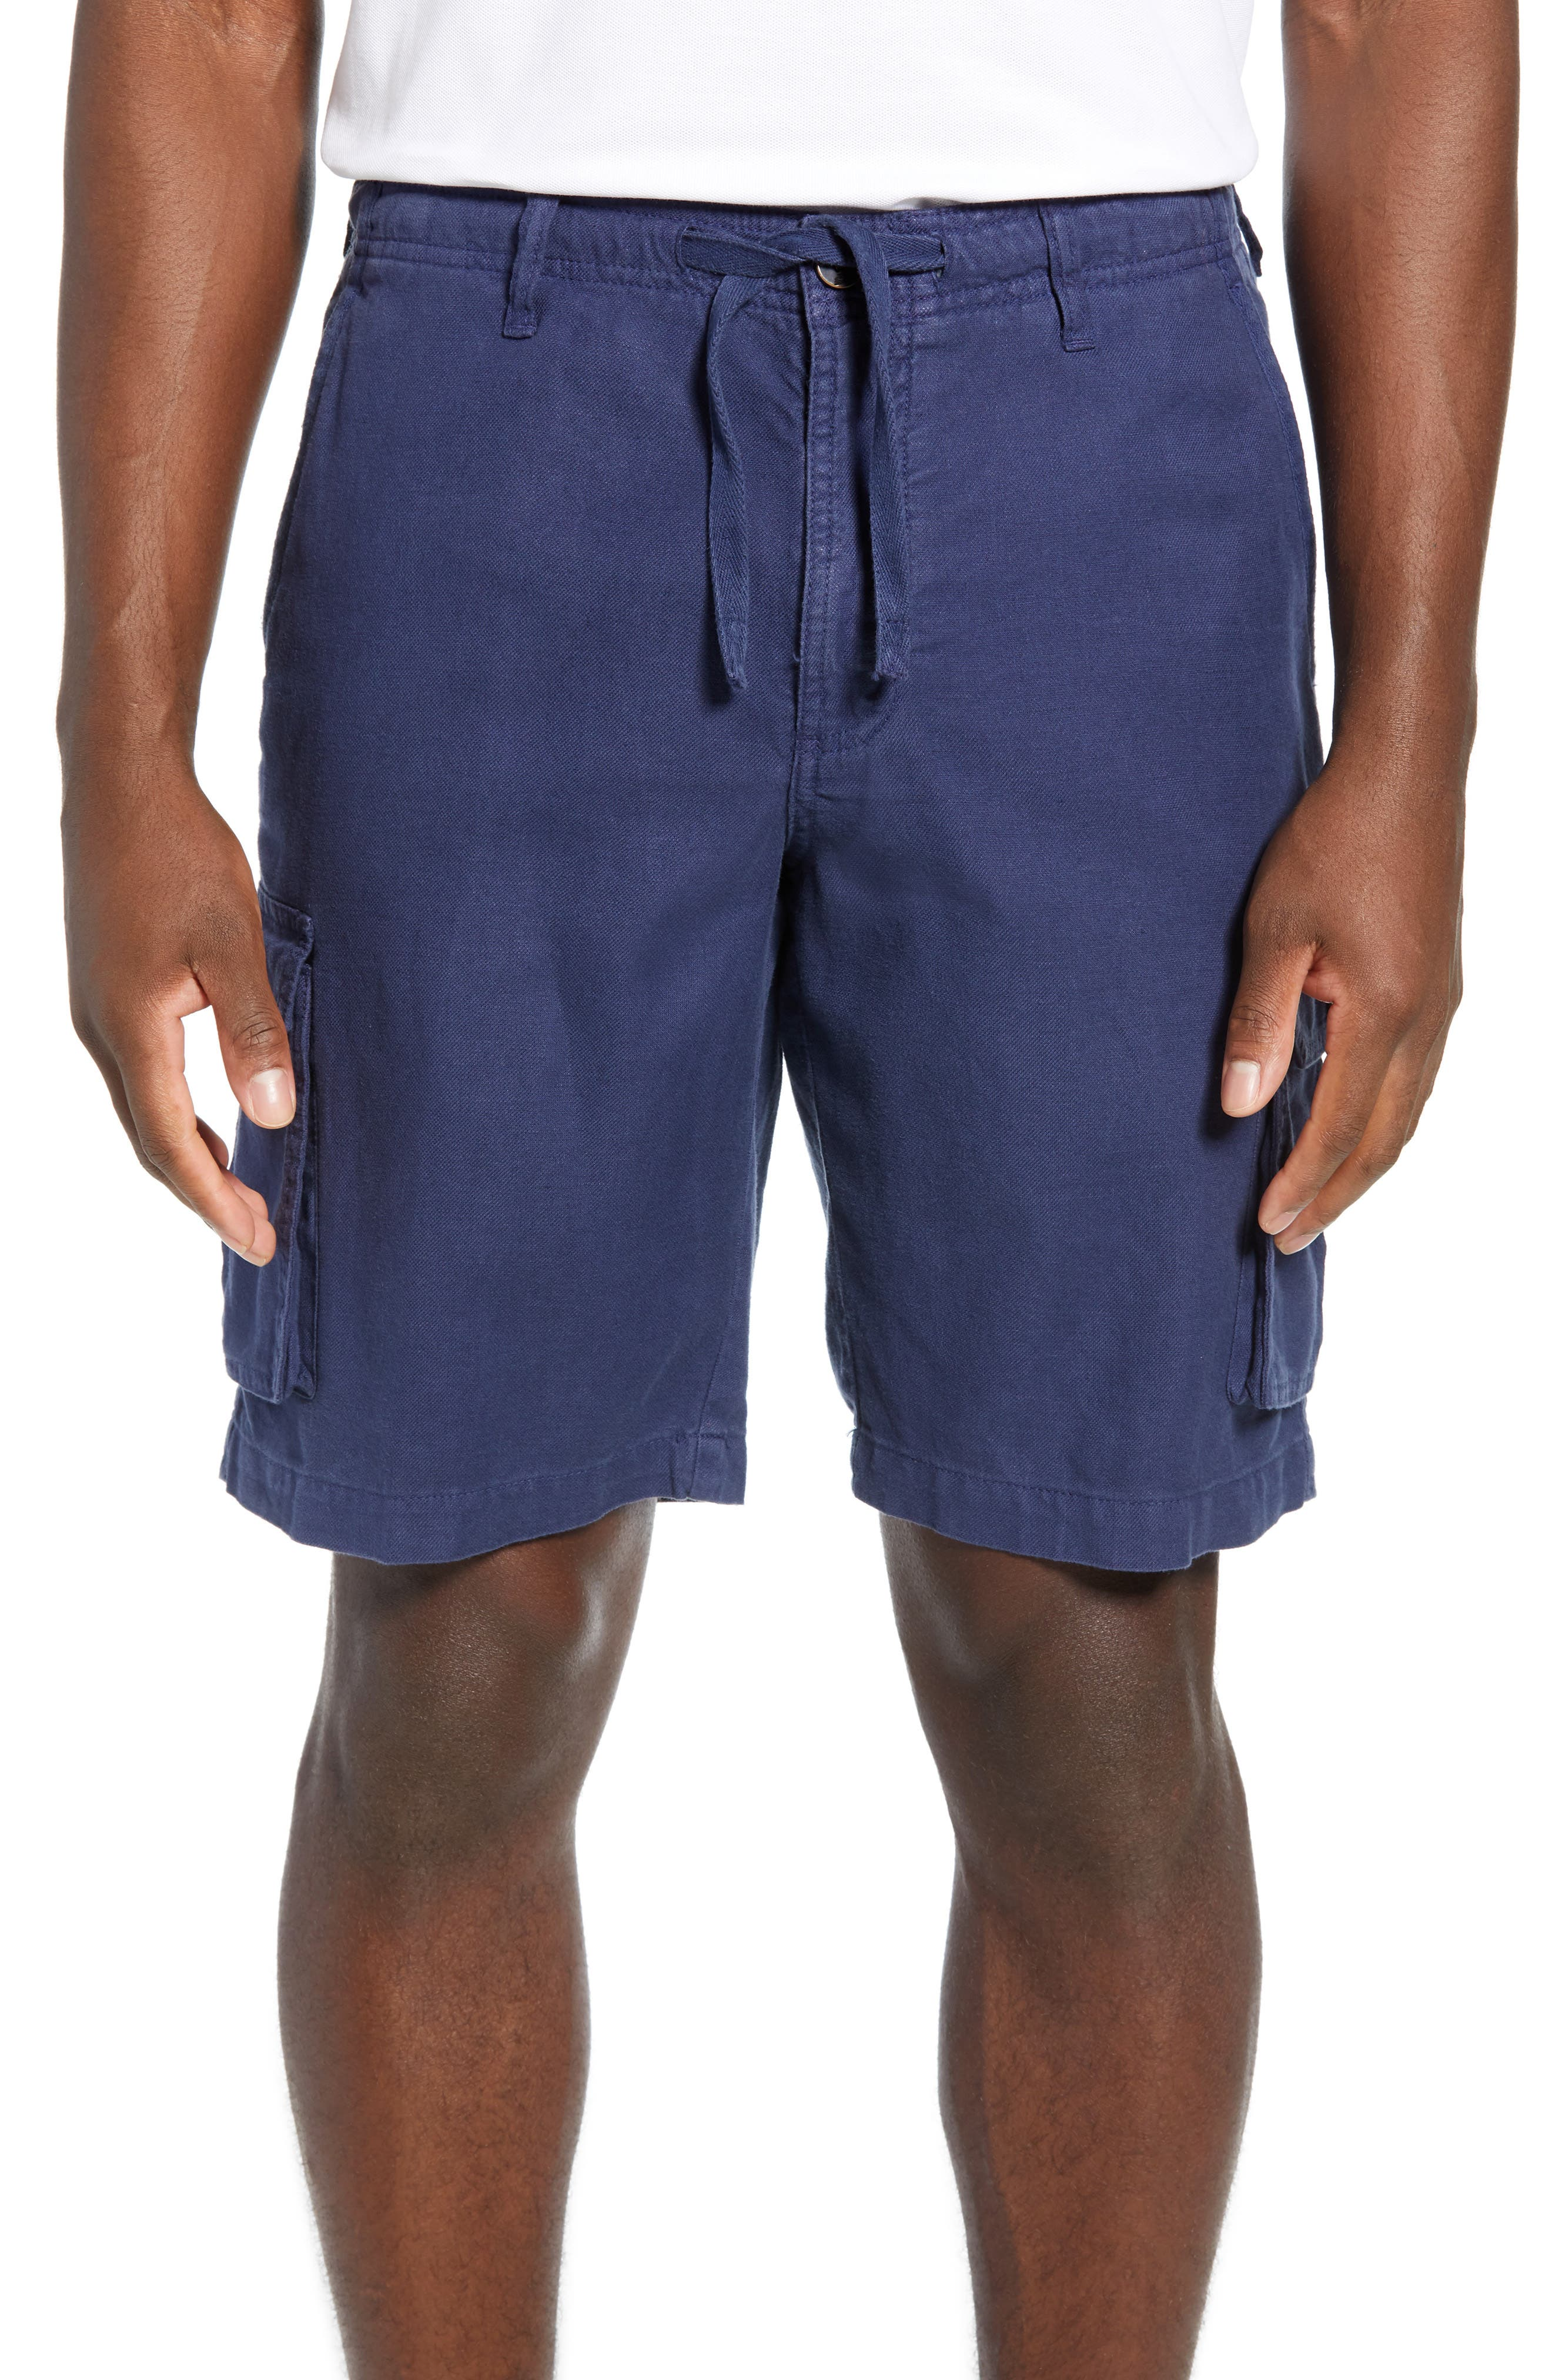 Tommy Bahama Soleil Beach Cargo Shorts